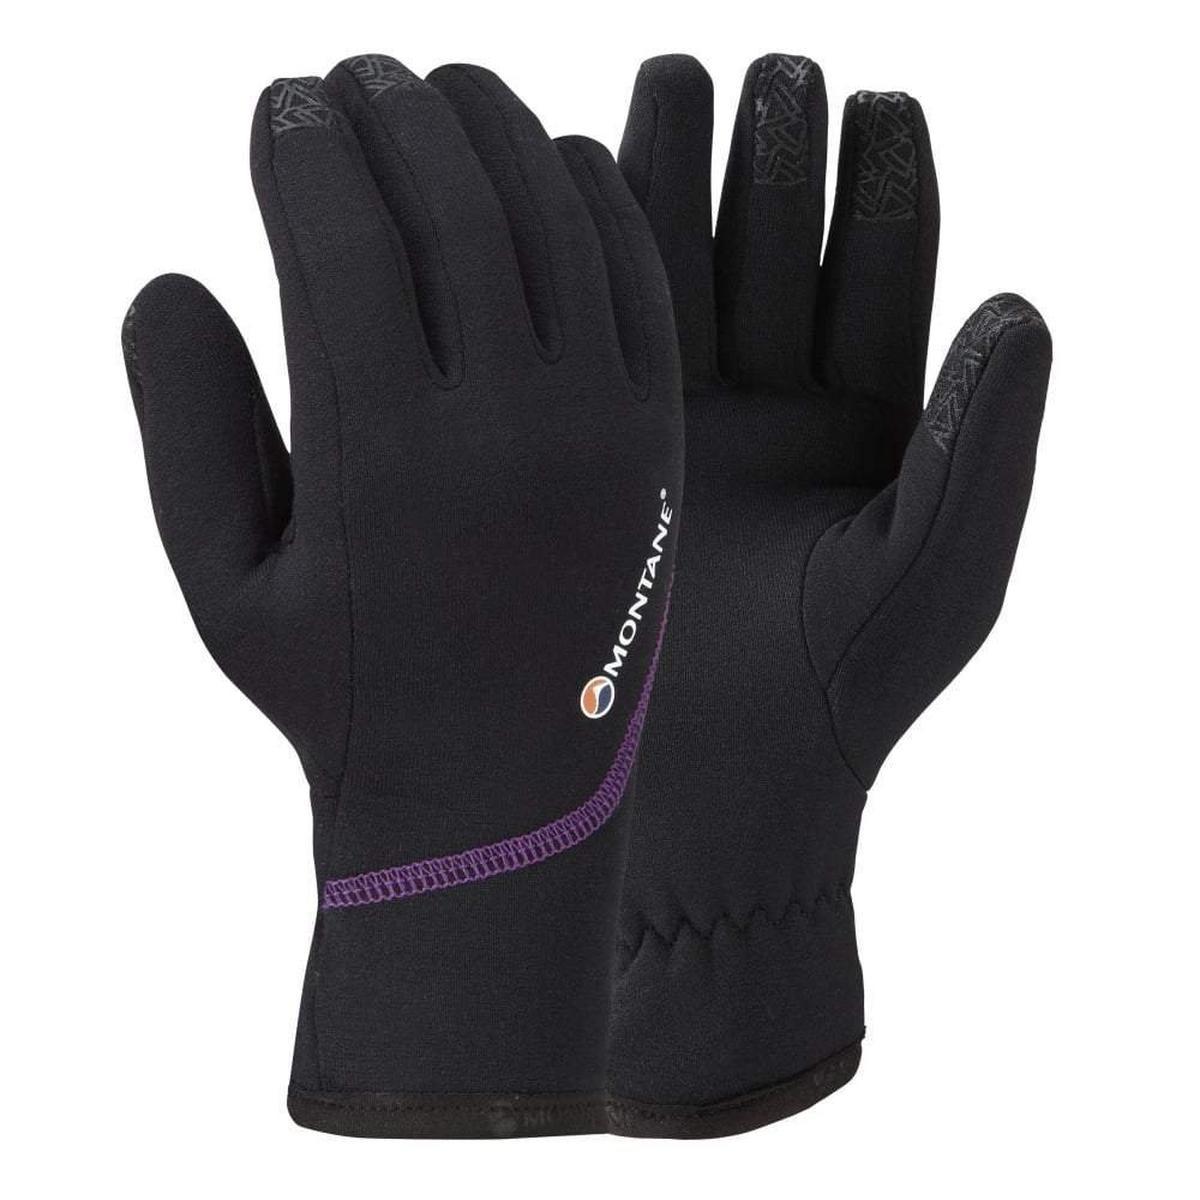 Montane Women's Montane Powerstretch Pro Glove - Black